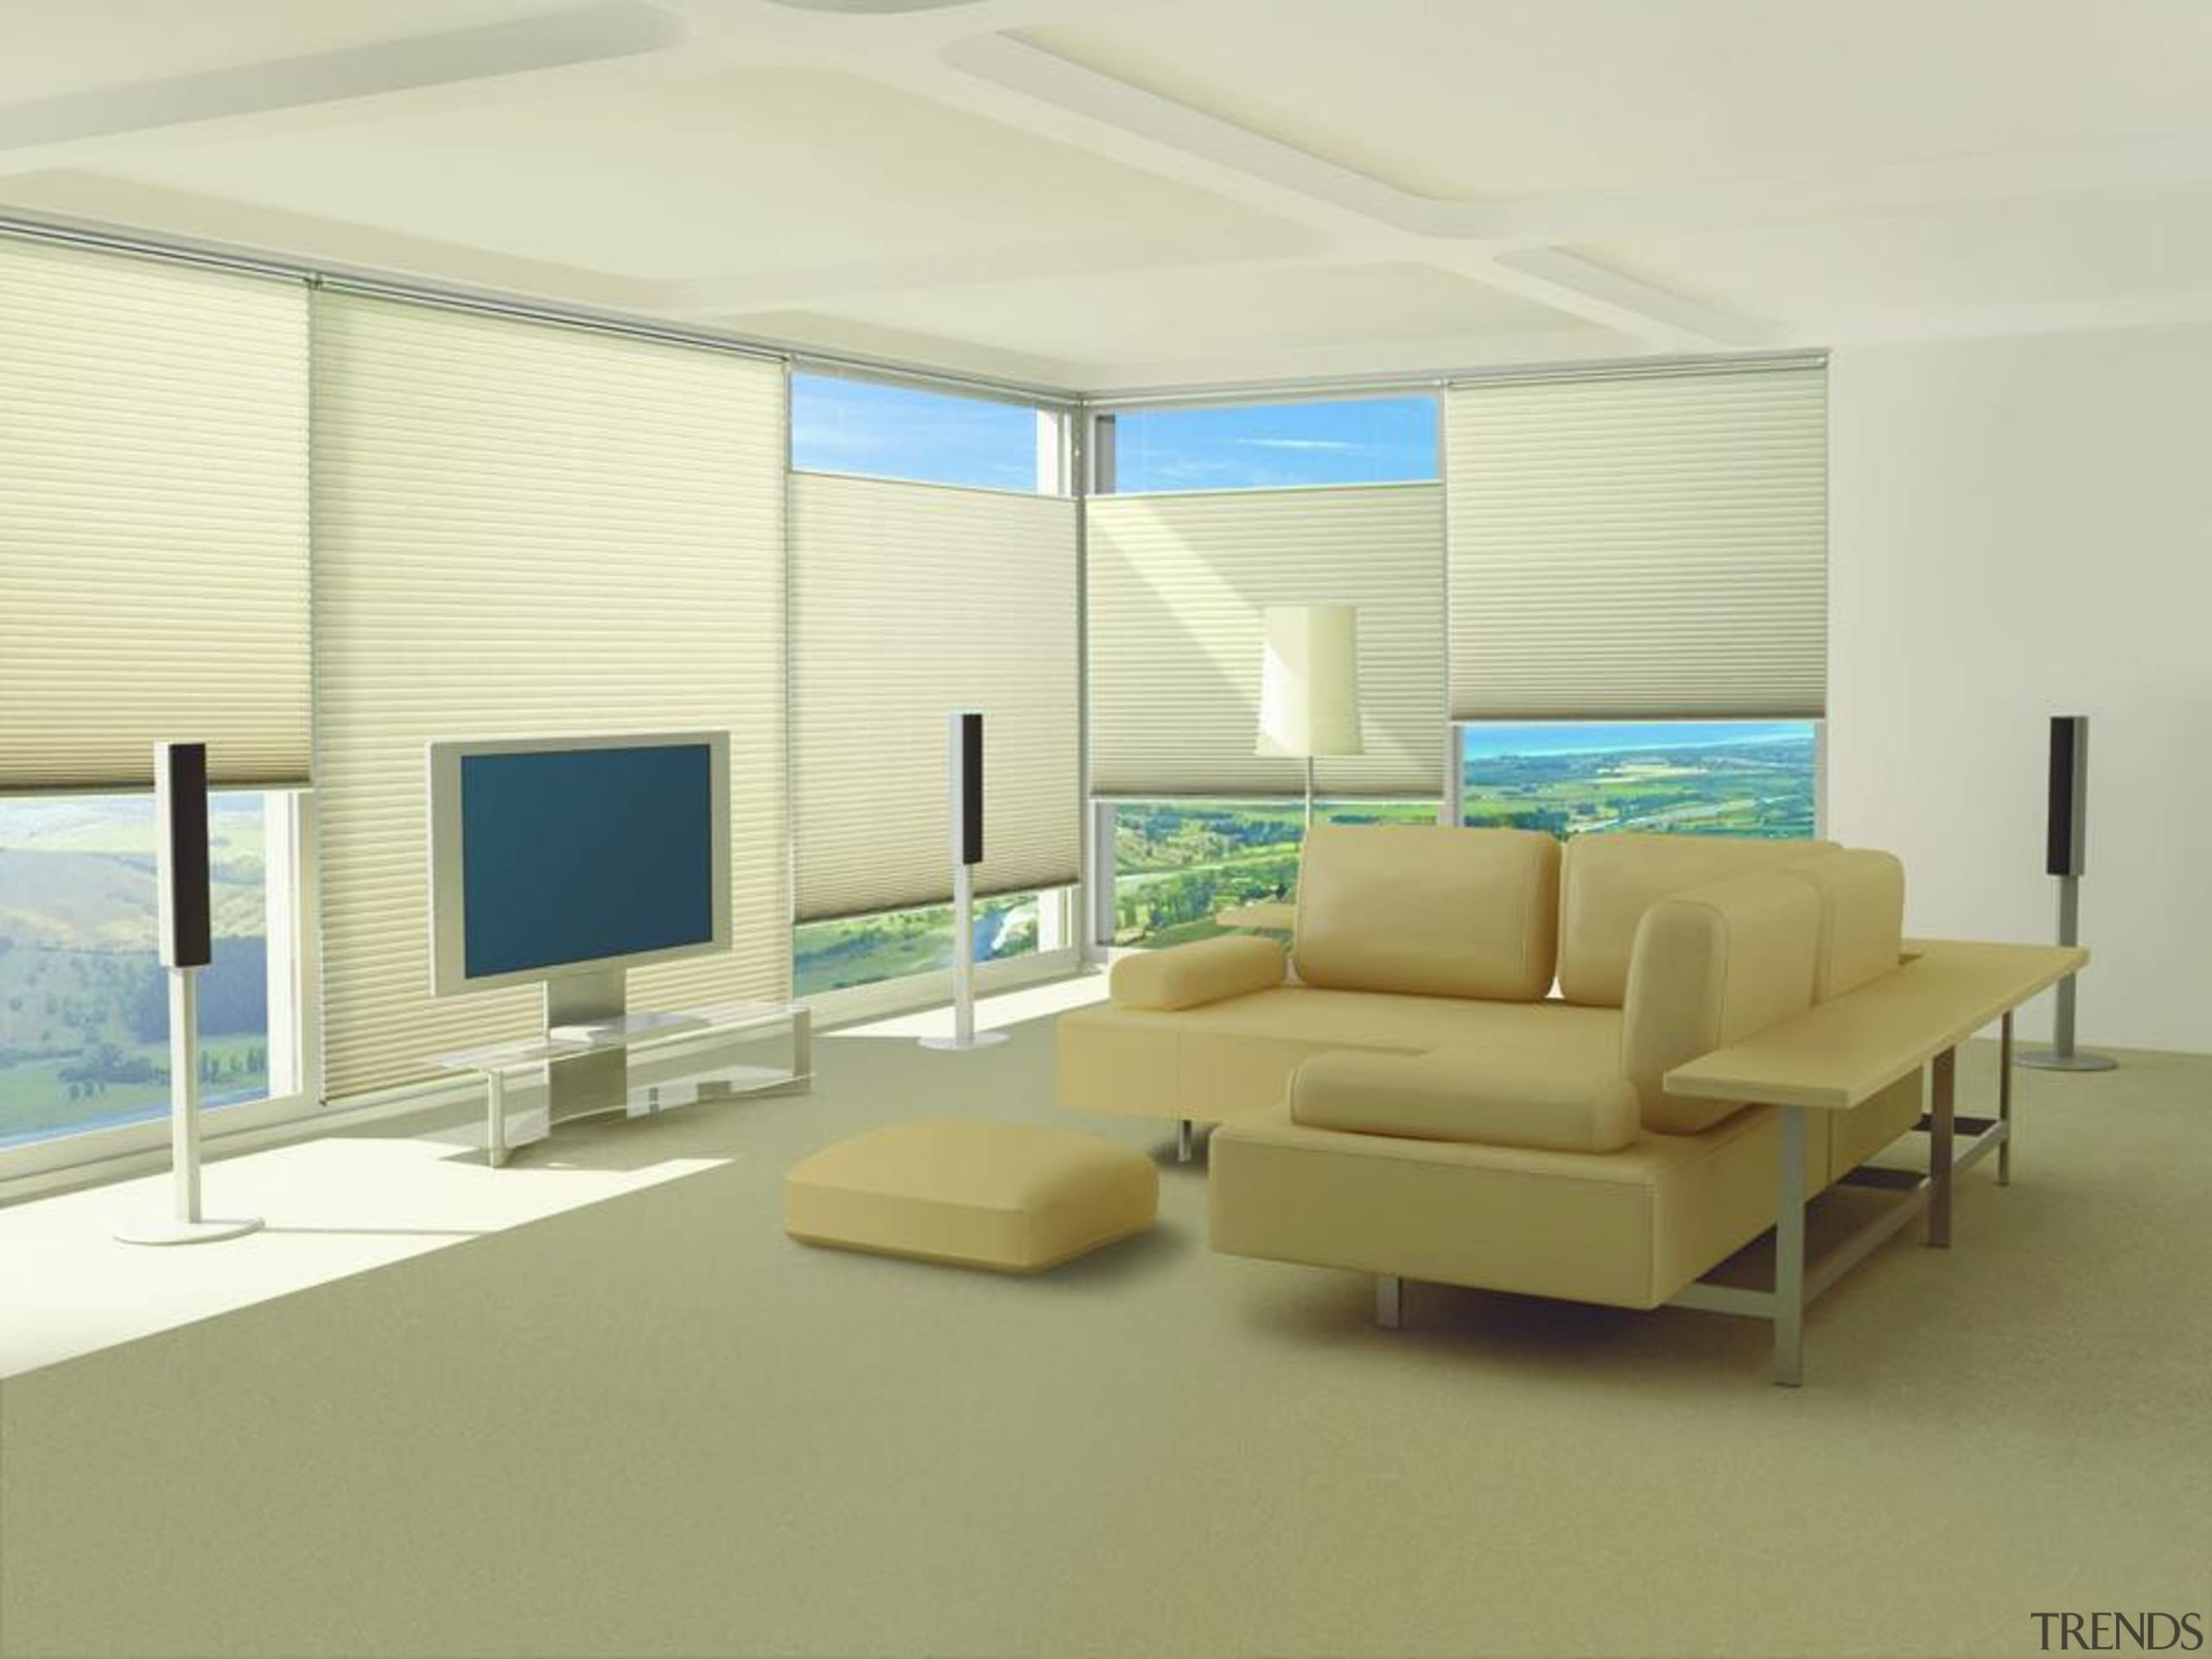 luxaflex duette shades - luxaflex duette shades - architecture, ceiling, daylighting, floor, interior design, living room, real estate, shade, wall, window, window blind, window covering, window treatment, yellow